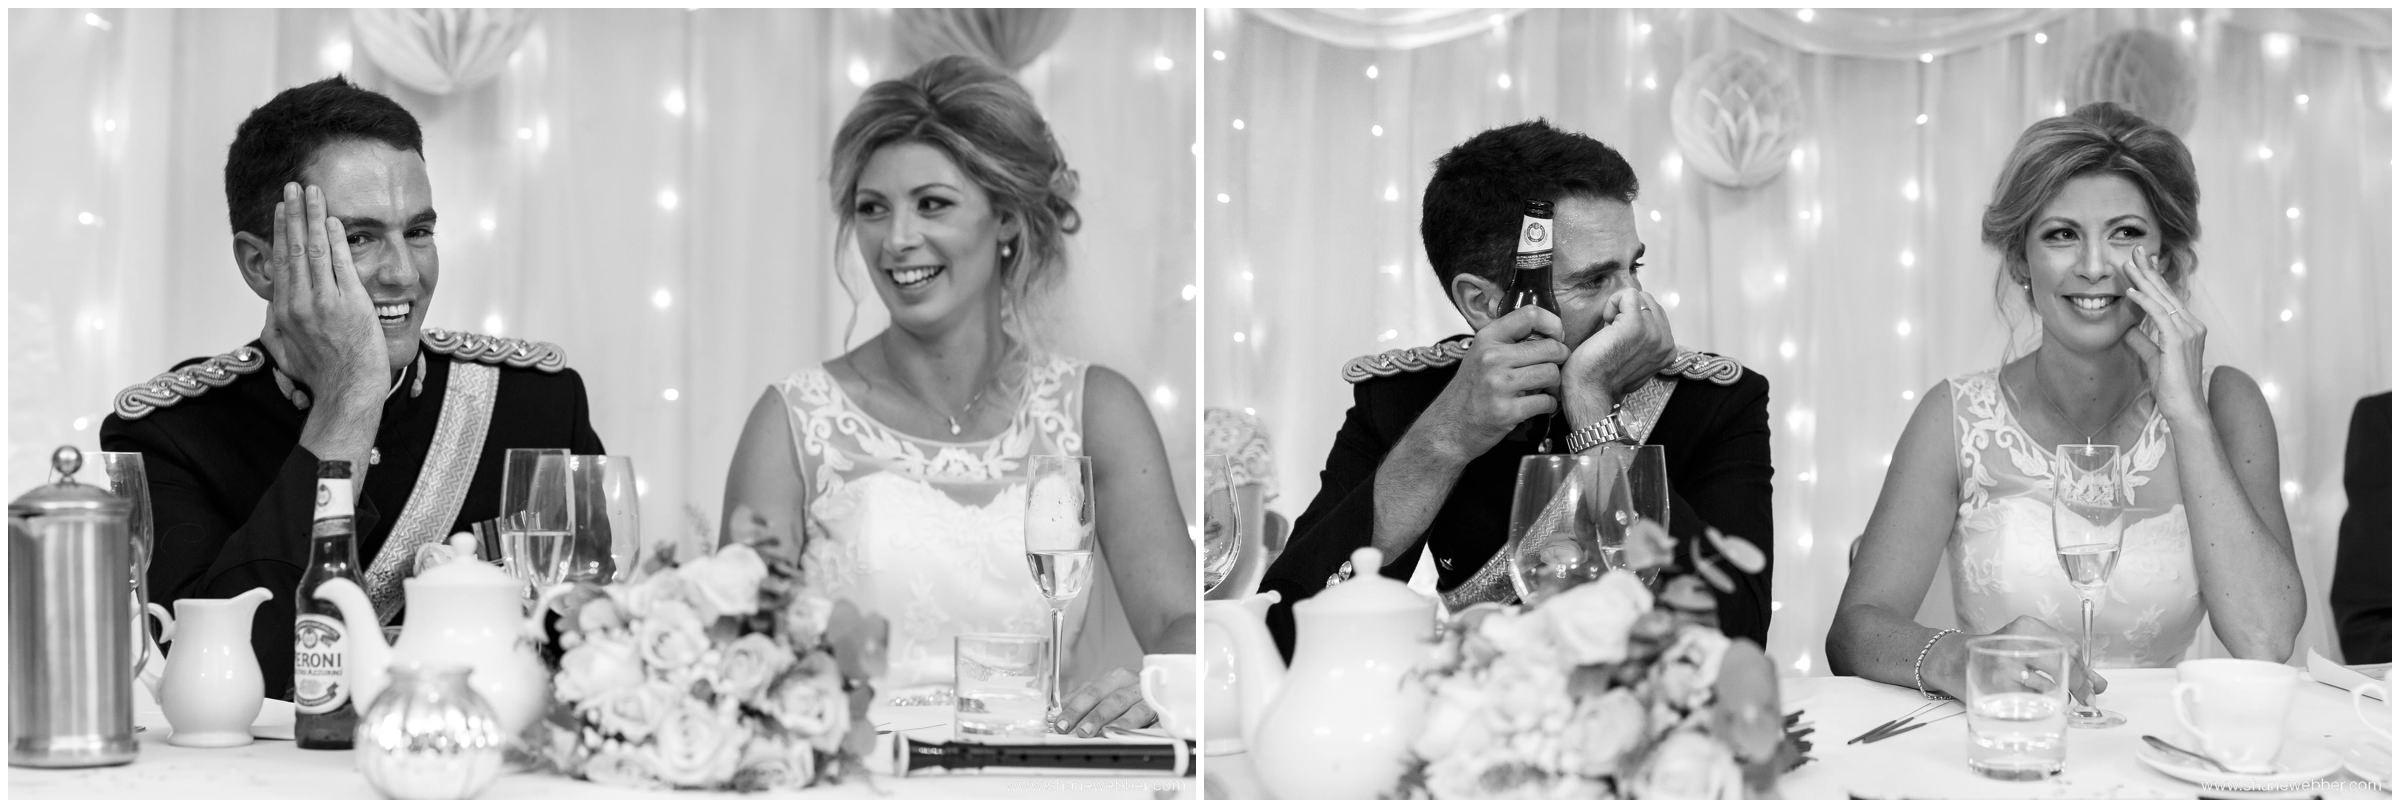 Embarrassed groom